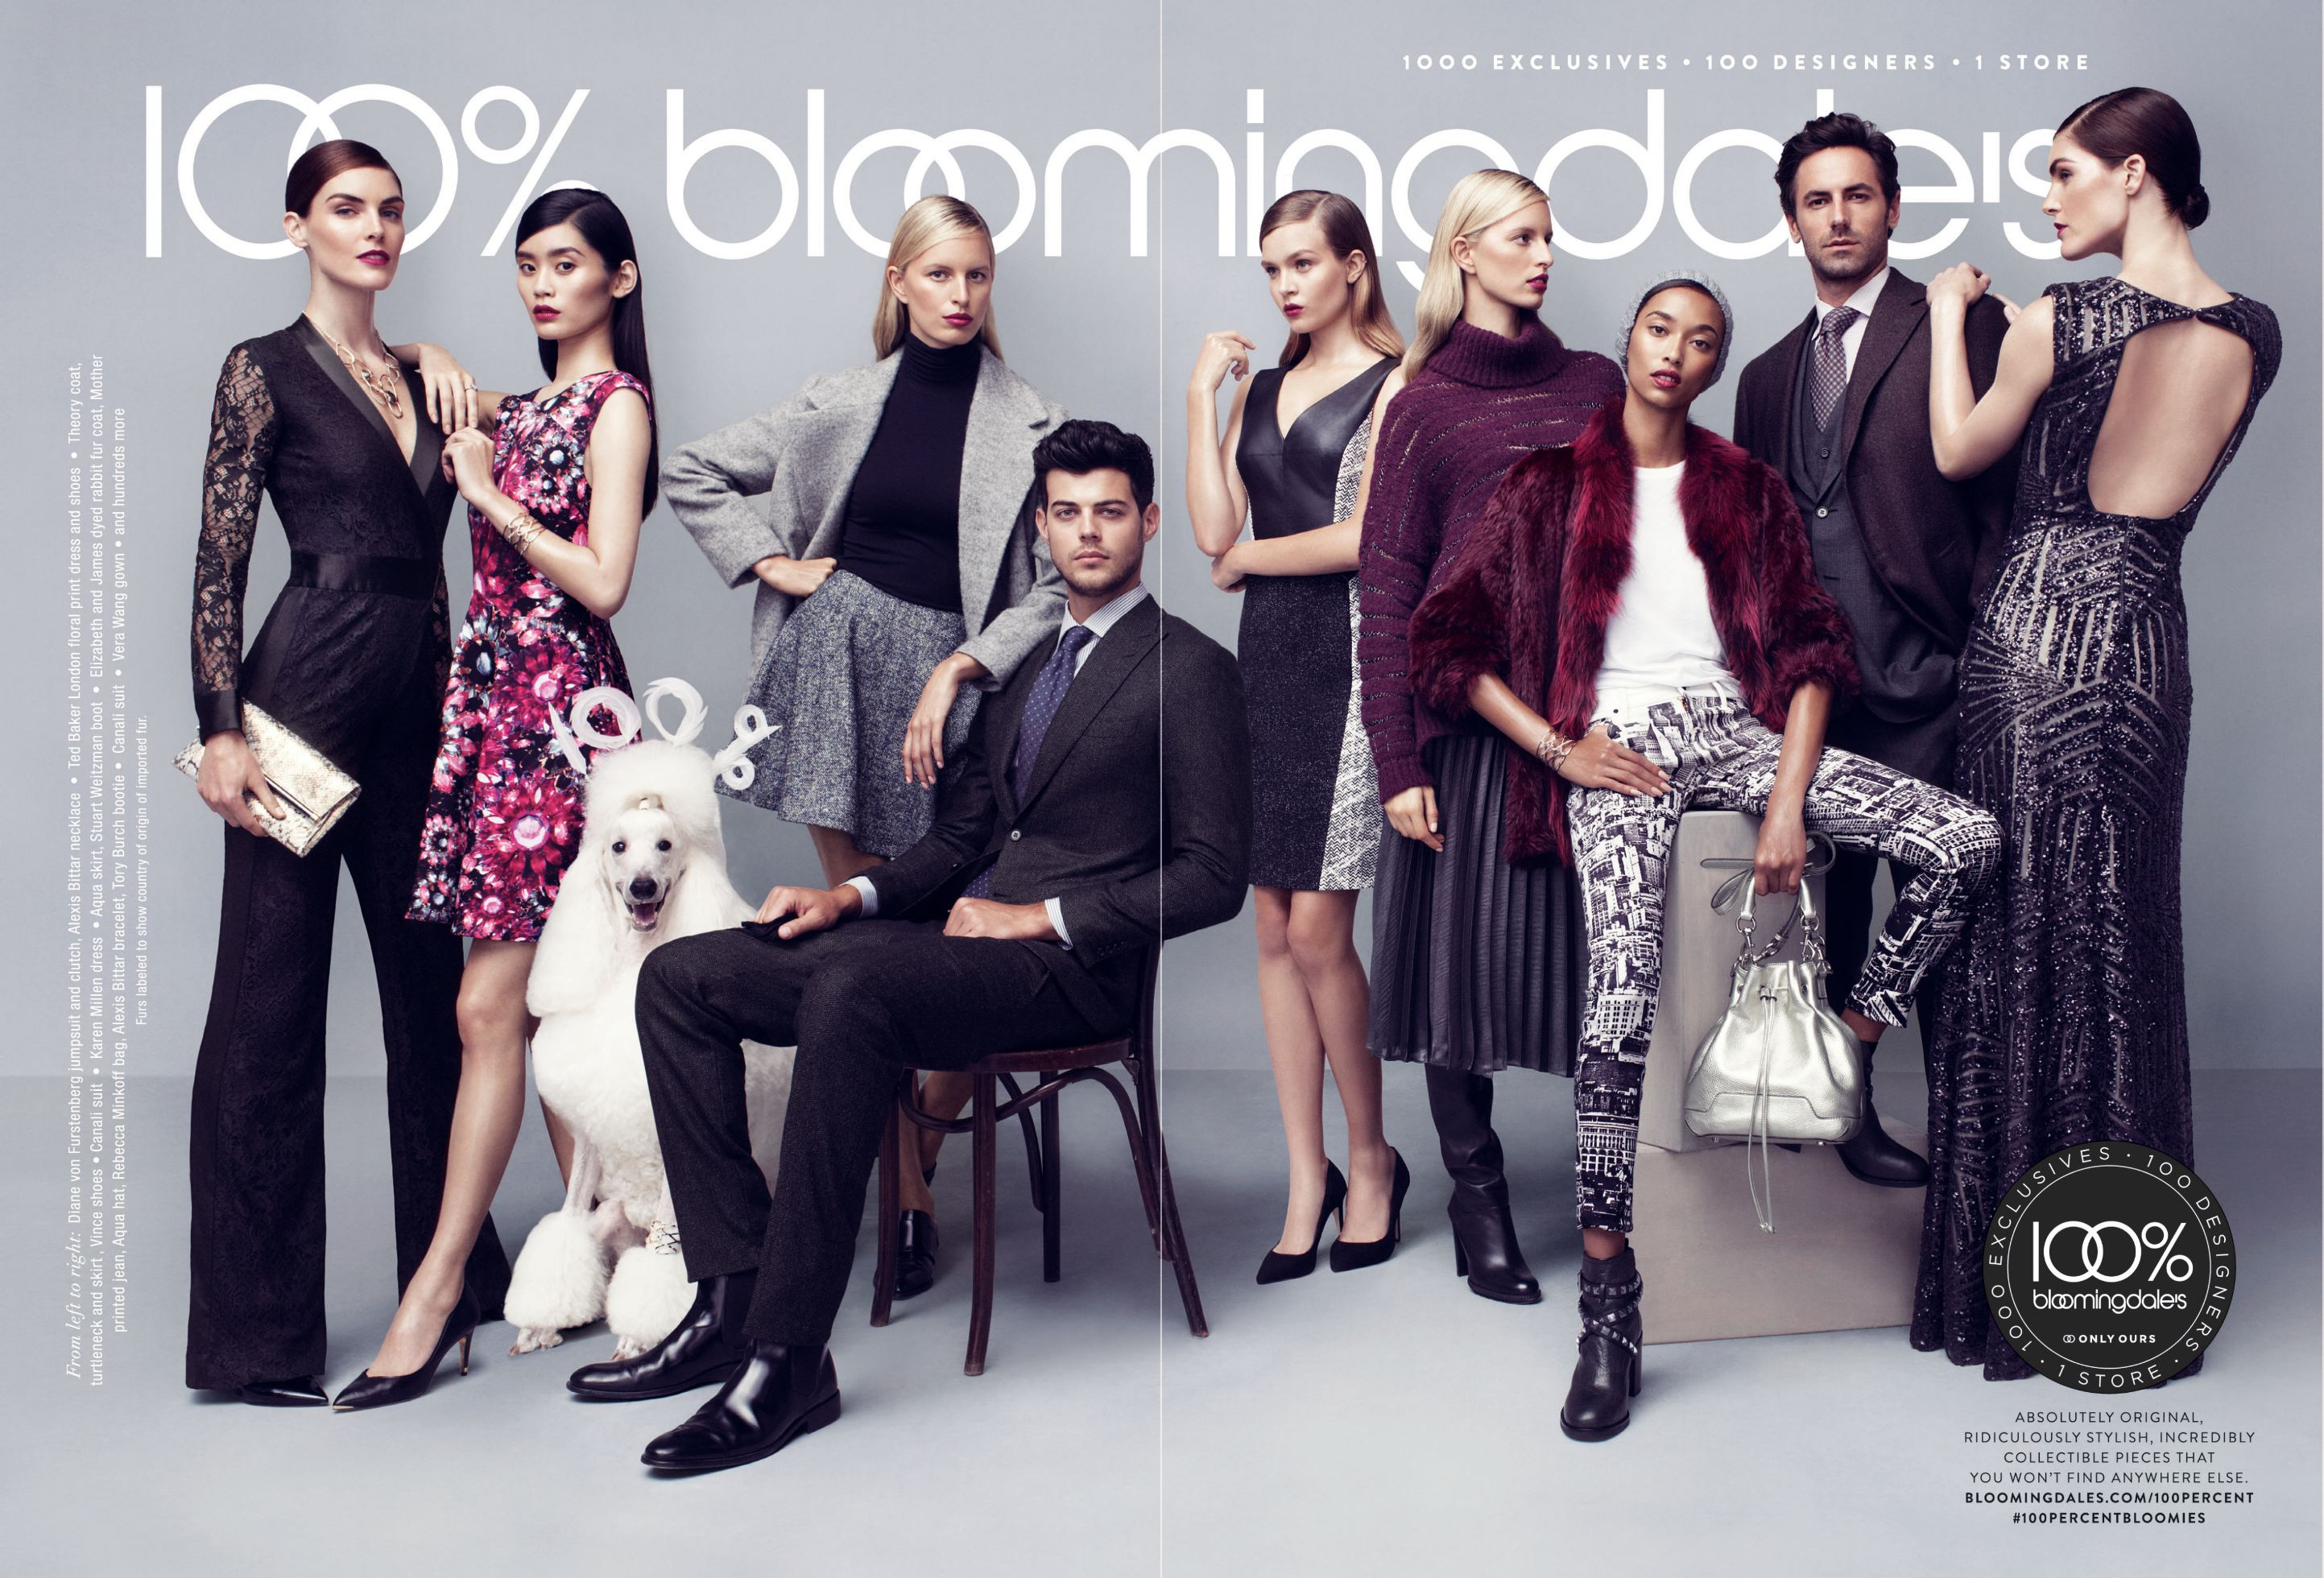 Josh Wald + Felix Bujo for Bloomingdale's 100% Fall 2014 Campaign